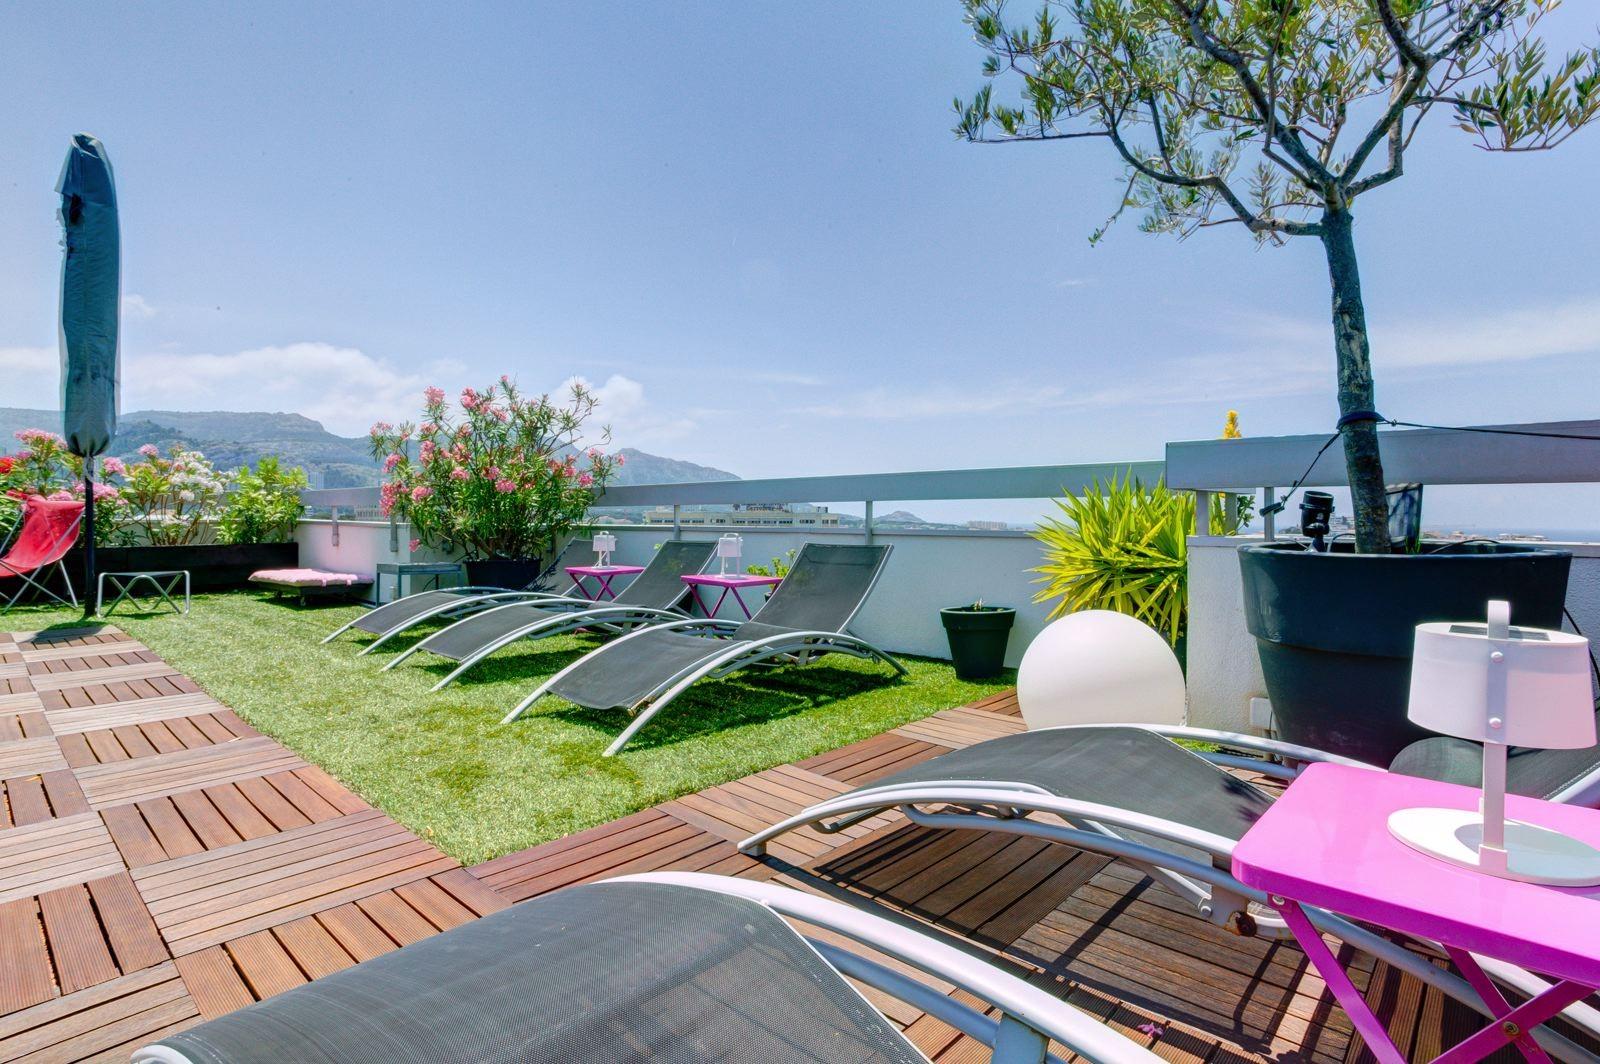 luxueux duplex terrasse vue mer dans le 8 me ma terrasse marseille. Black Bedroom Furniture Sets. Home Design Ideas